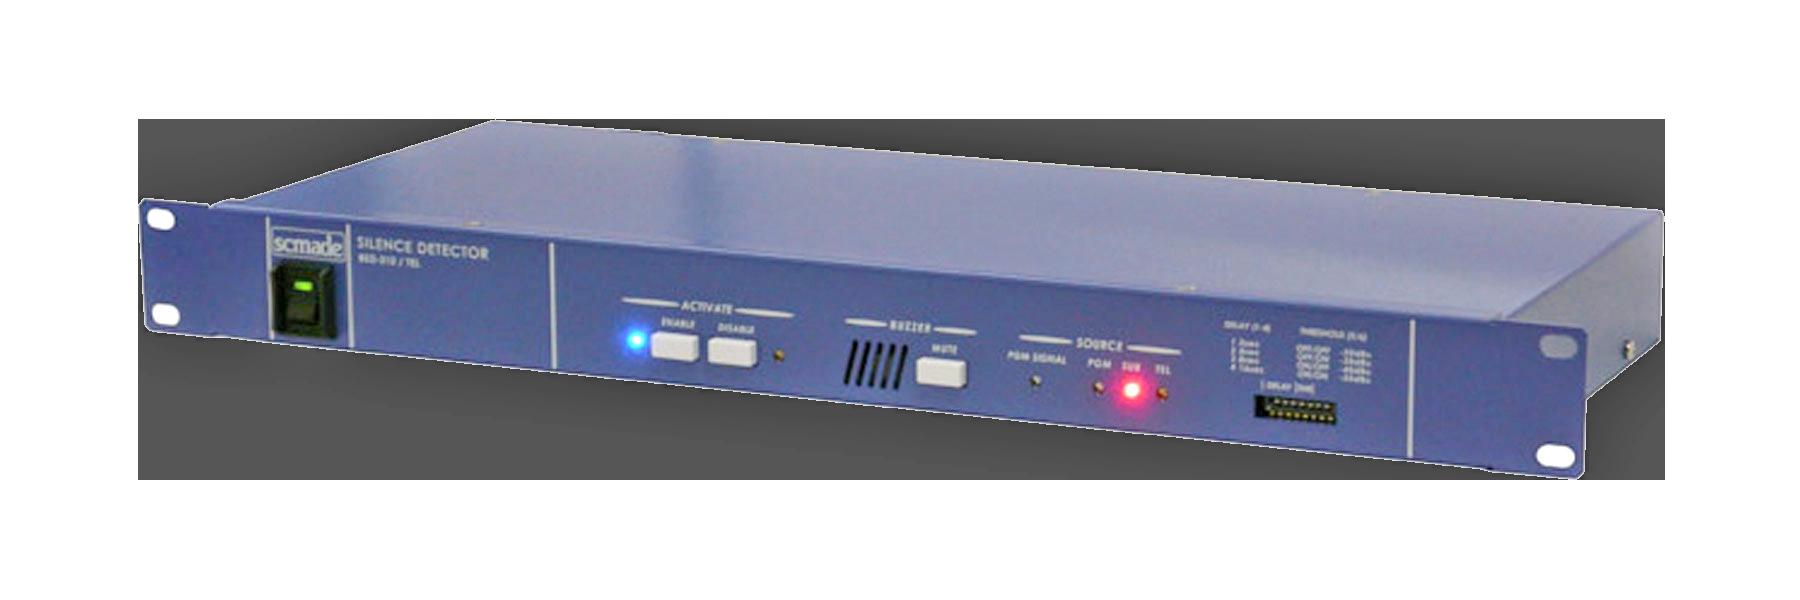 BSD-310